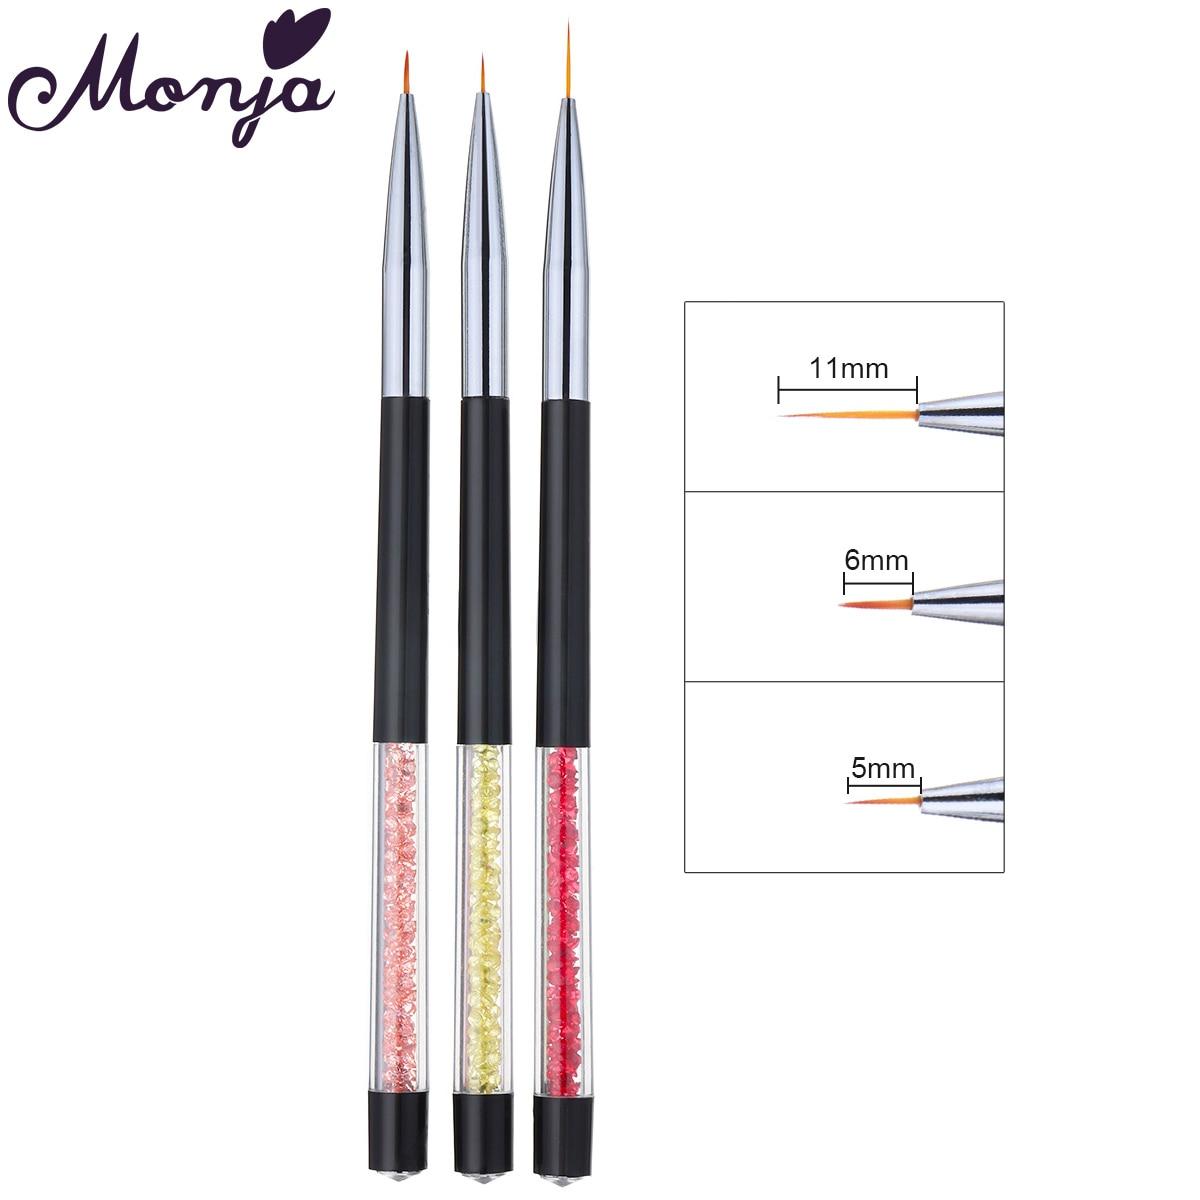 Monja 3Pcs/Set Nail Art Rhinestone Handle French Lines Stripes Liner Painting Brush Pattern Design DIY Drawing Pen Manicure Tool